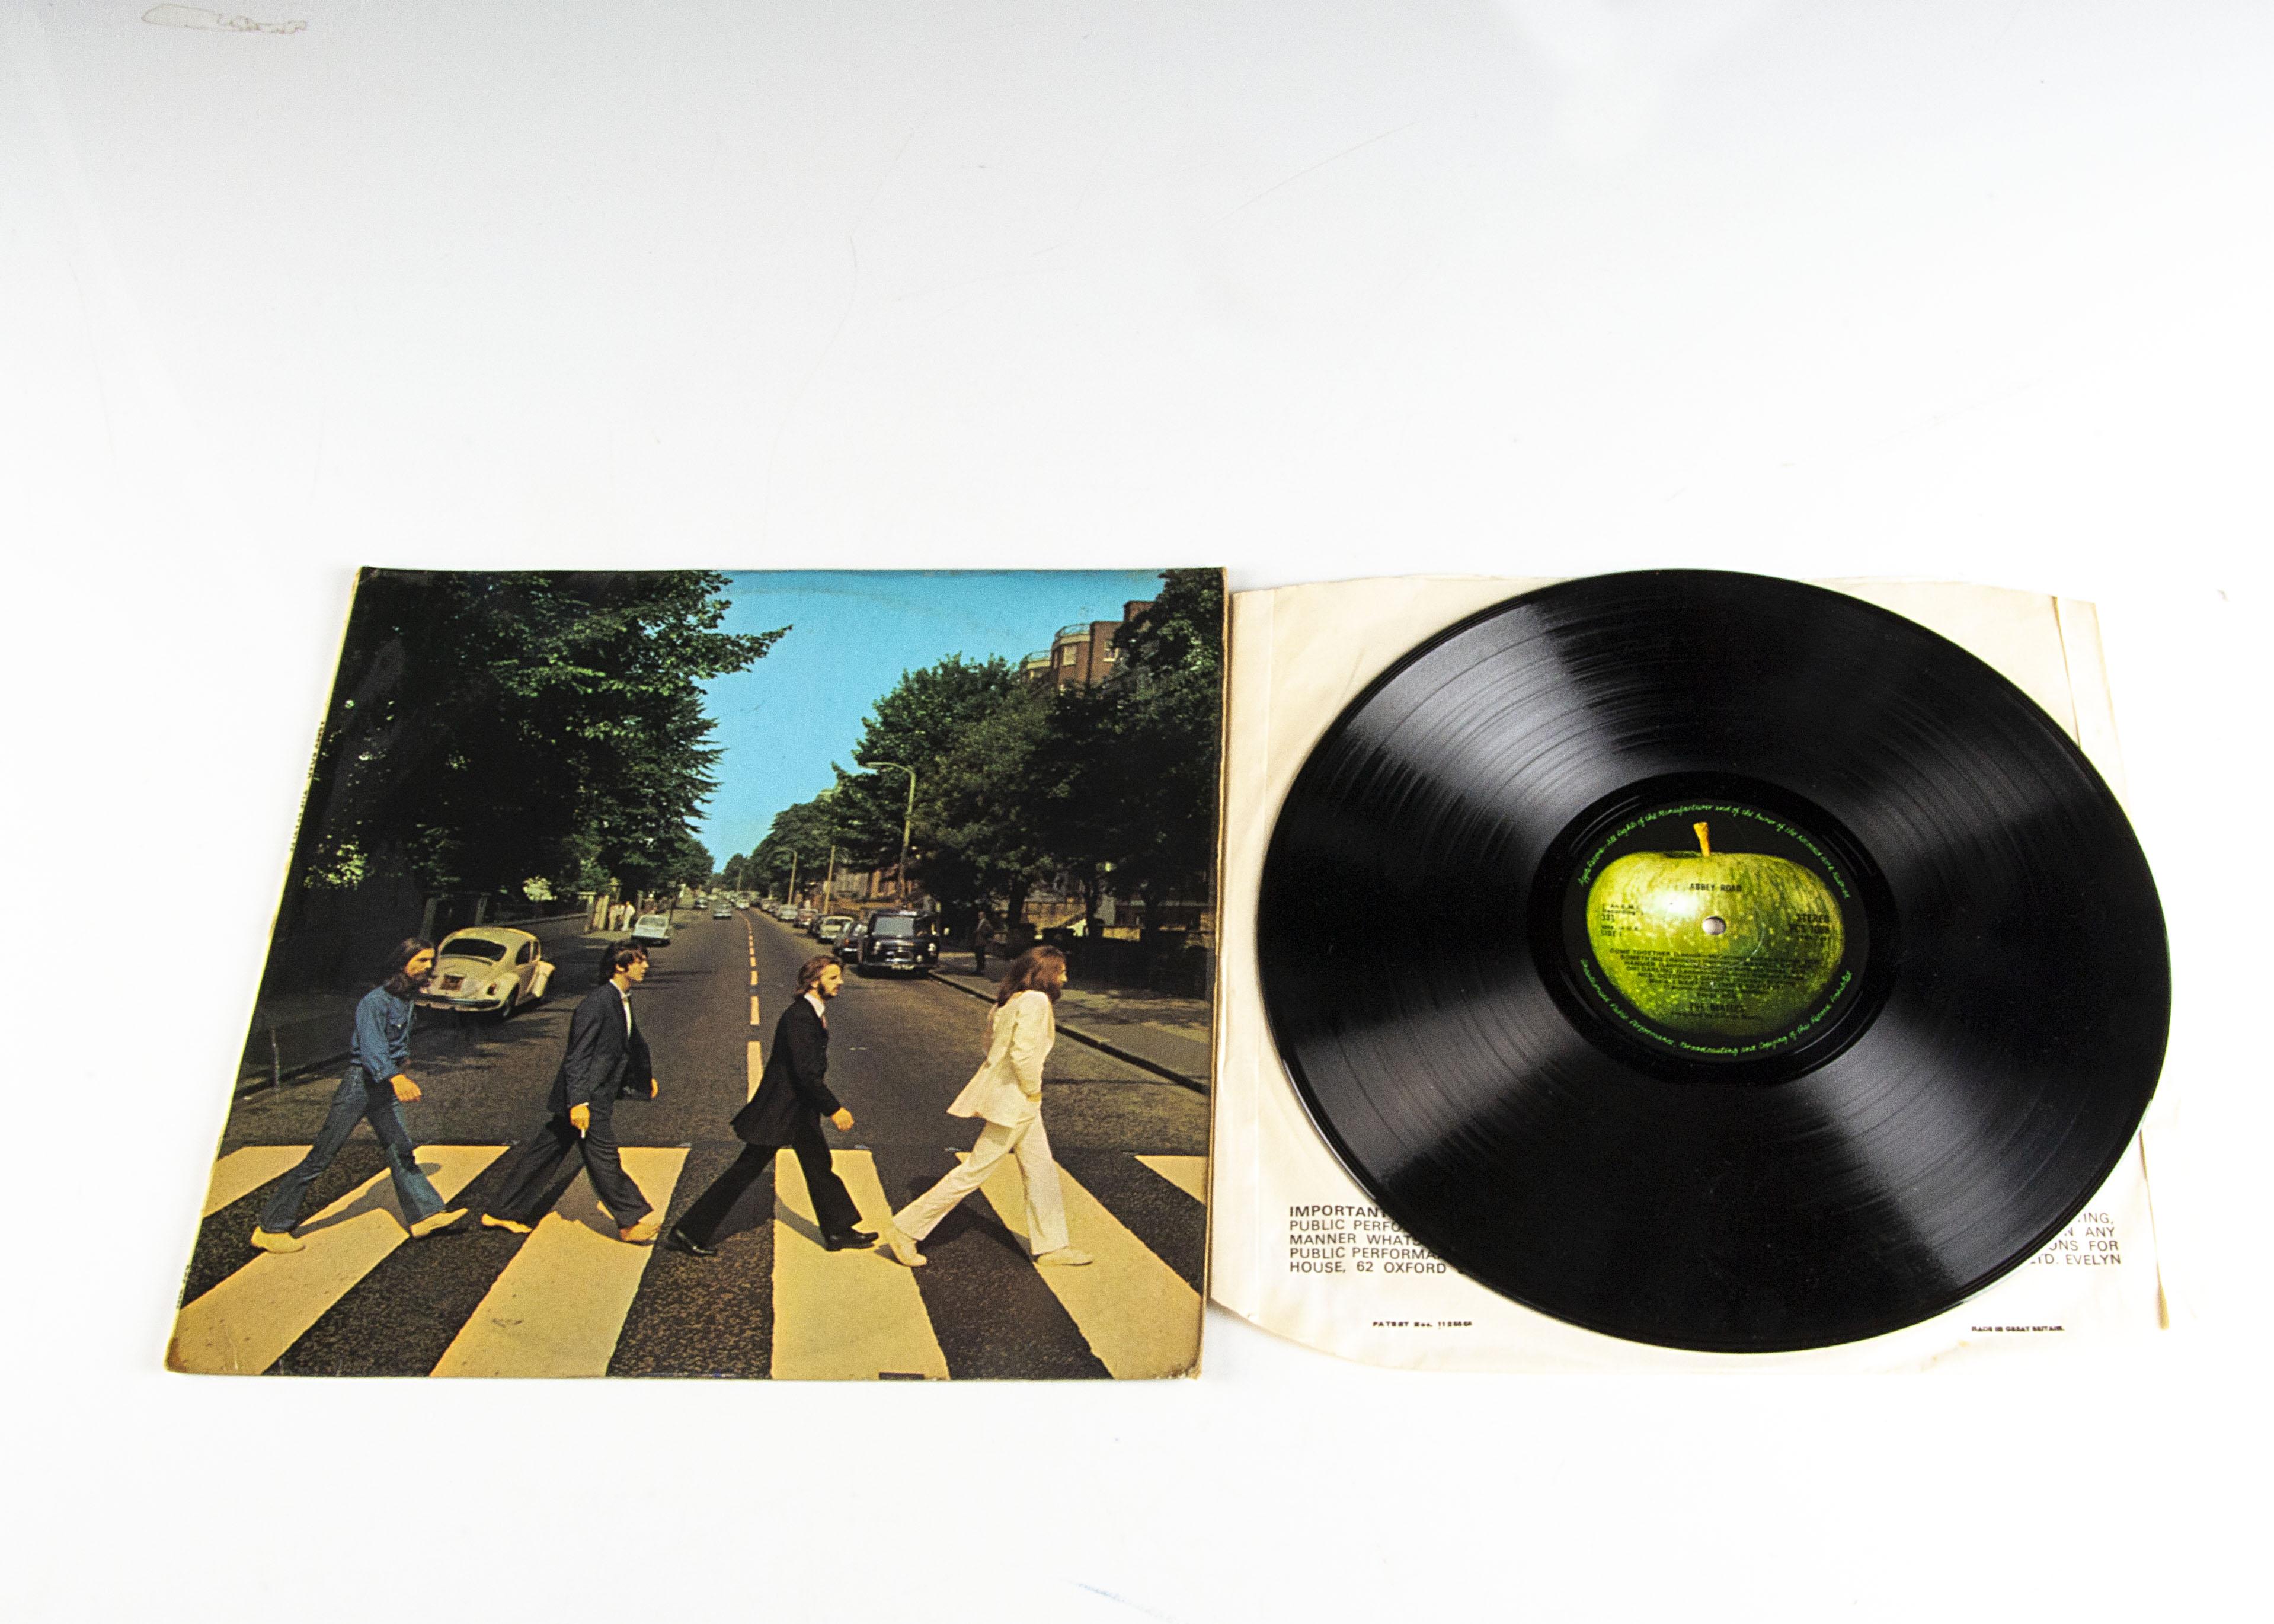 Beatles LP, Abbey Road LP - UK original release on Apple 1969 - PCS 7088 - Fully Laminated